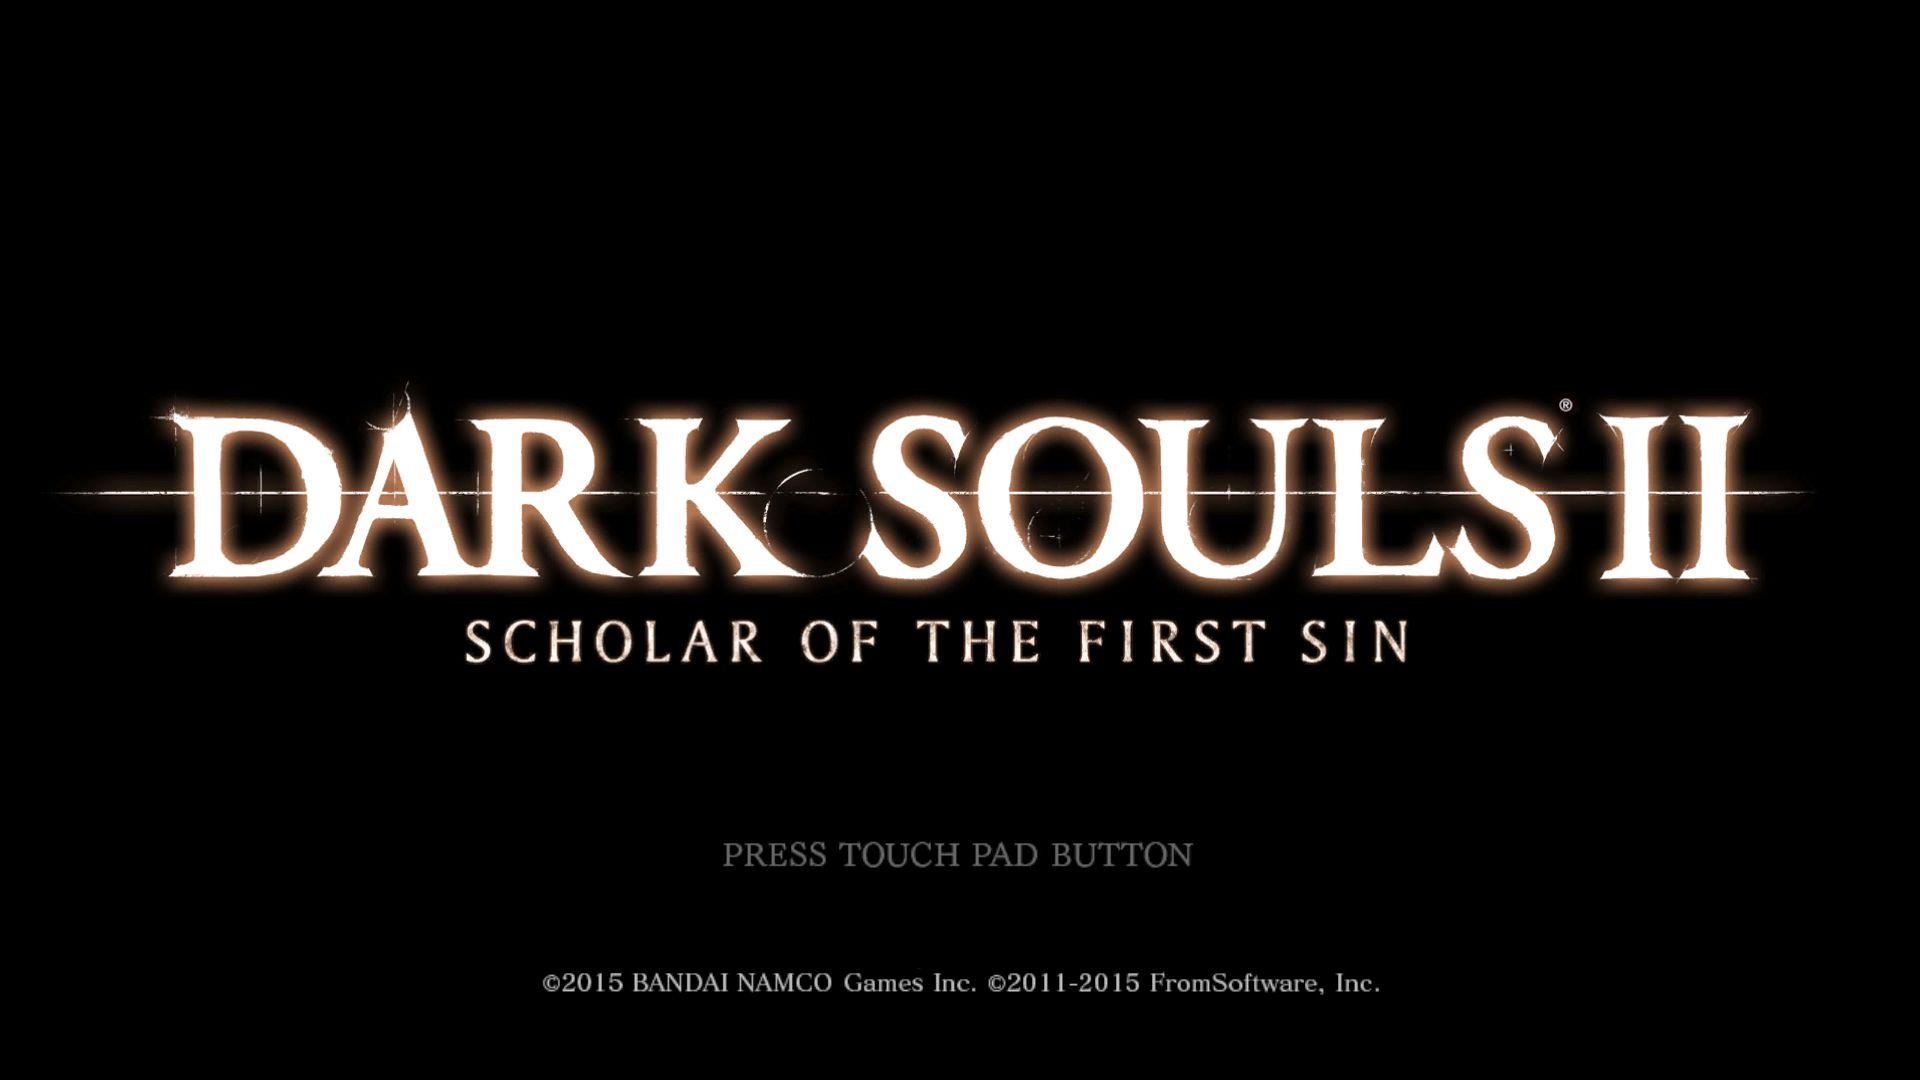 DARK SOULS Ⅱ SCHOLAR OF THE FIRST SIN Vol.7